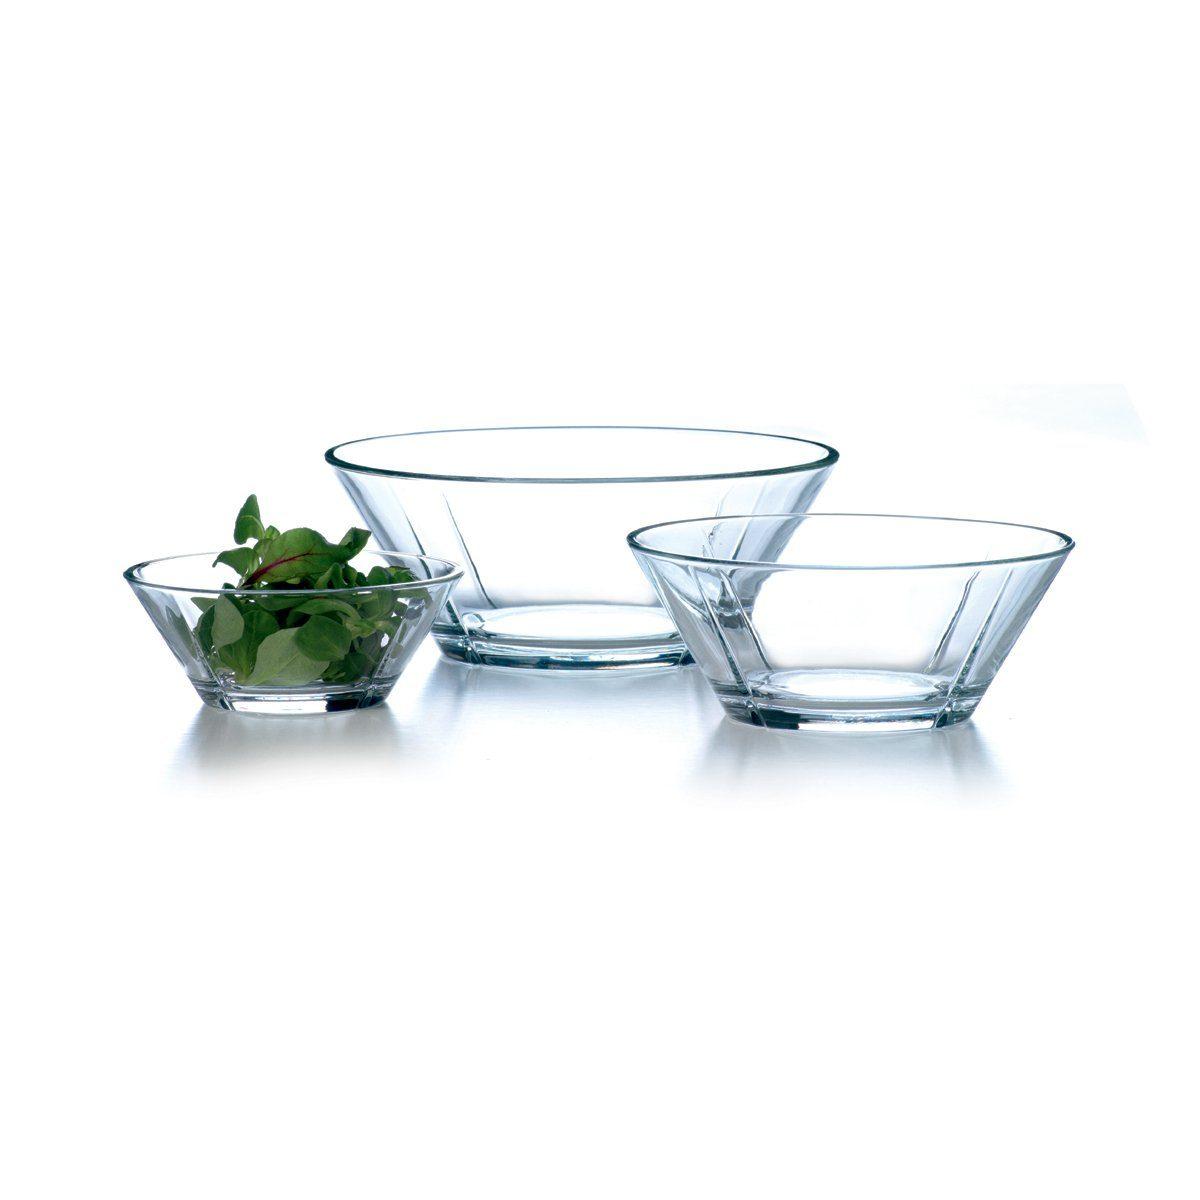 Rosendahl ROSENDAHL Grand Cru Glasschalen 3er Set